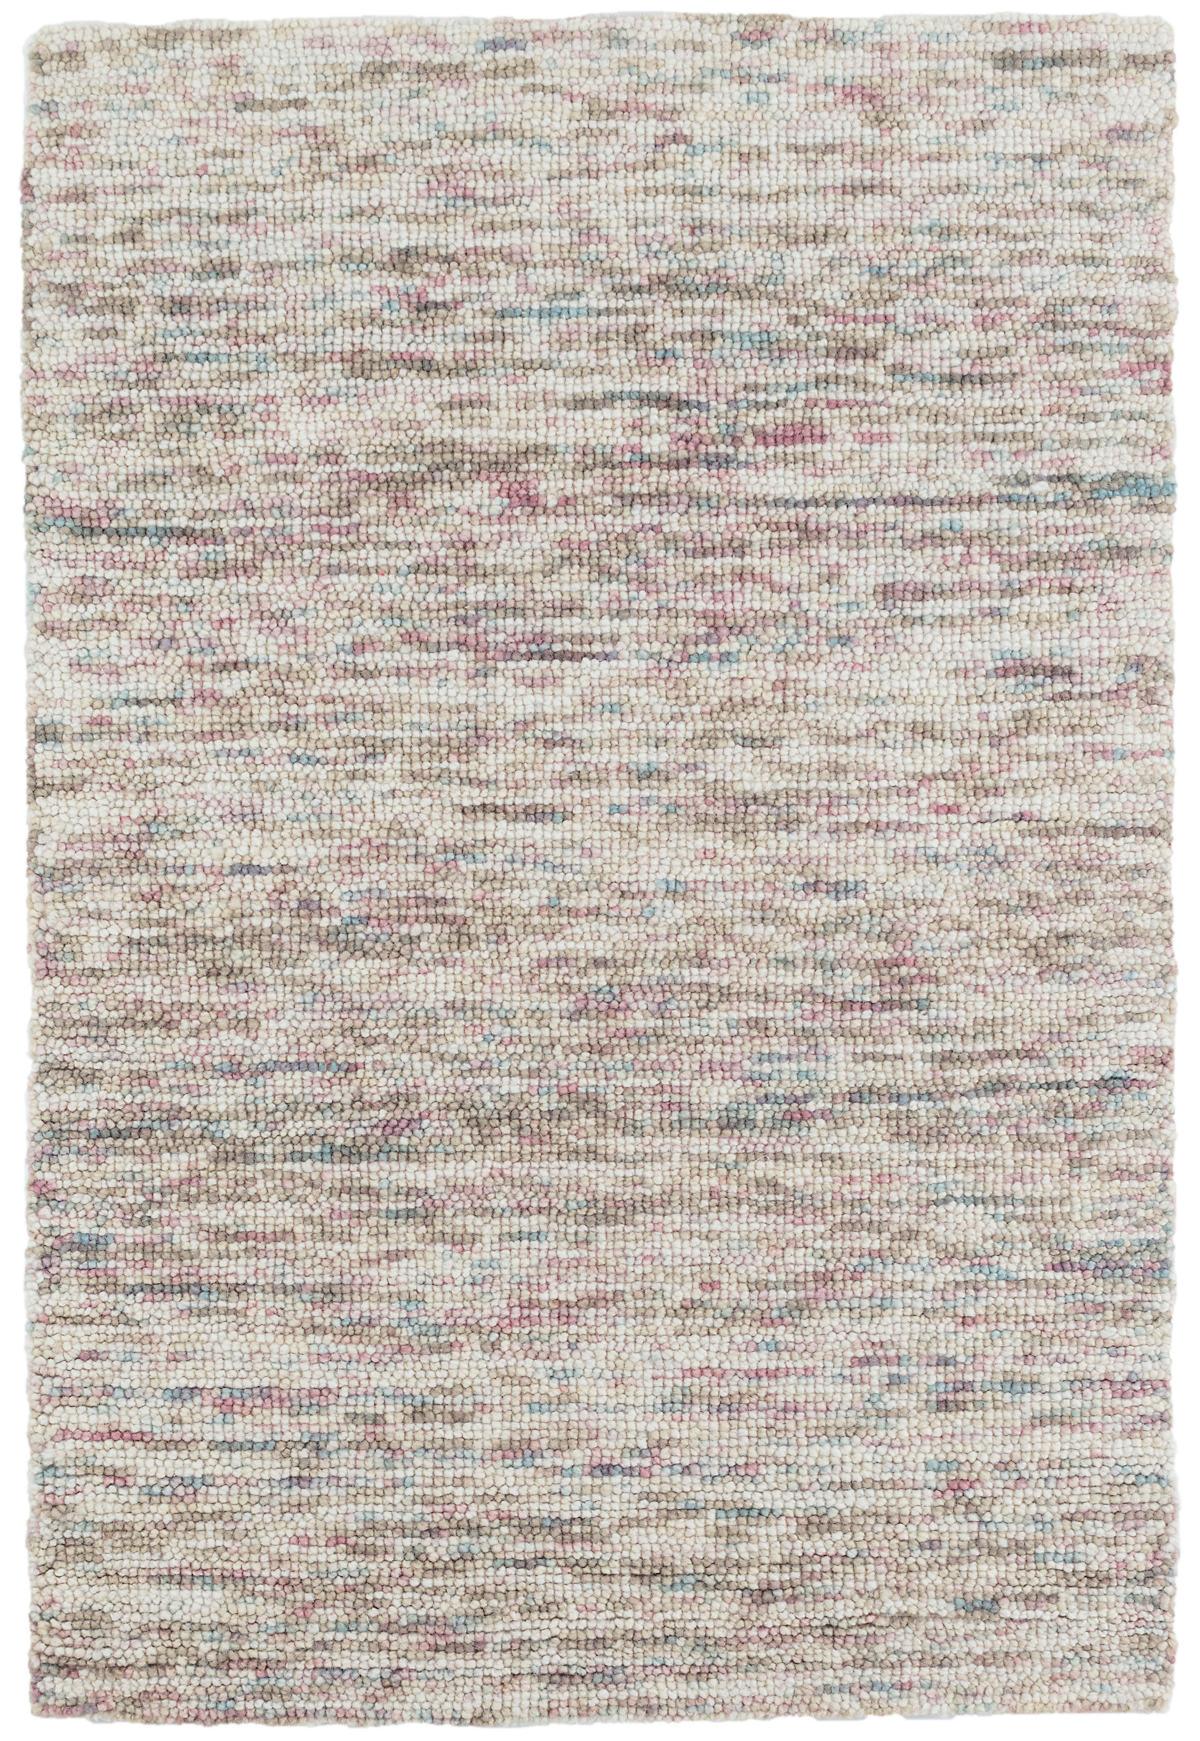 Artisanal Hooked Wool Rug